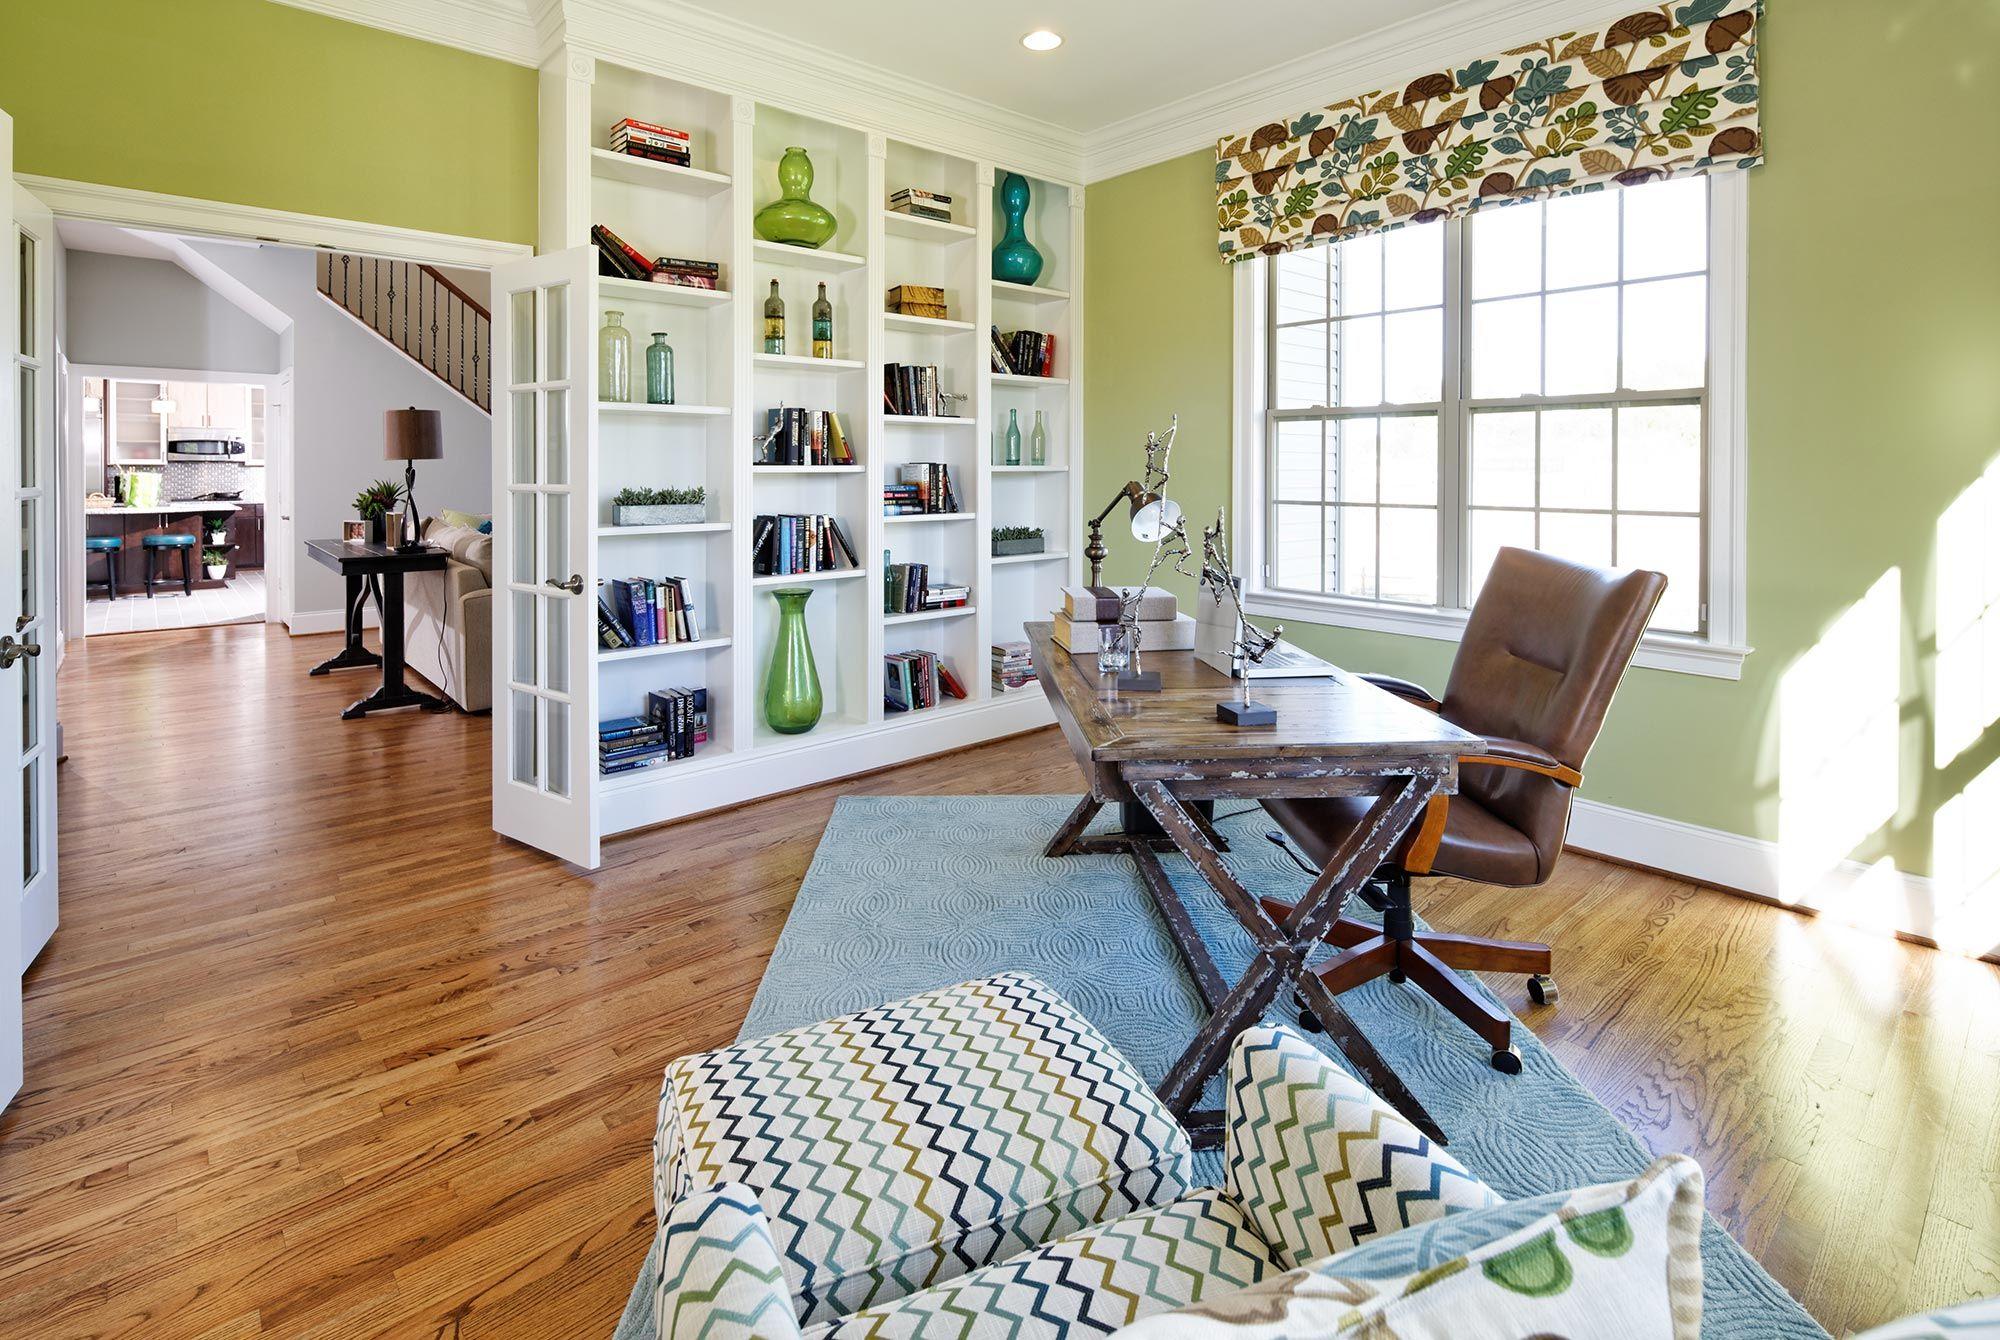 Home Designs | Craftmark Homes